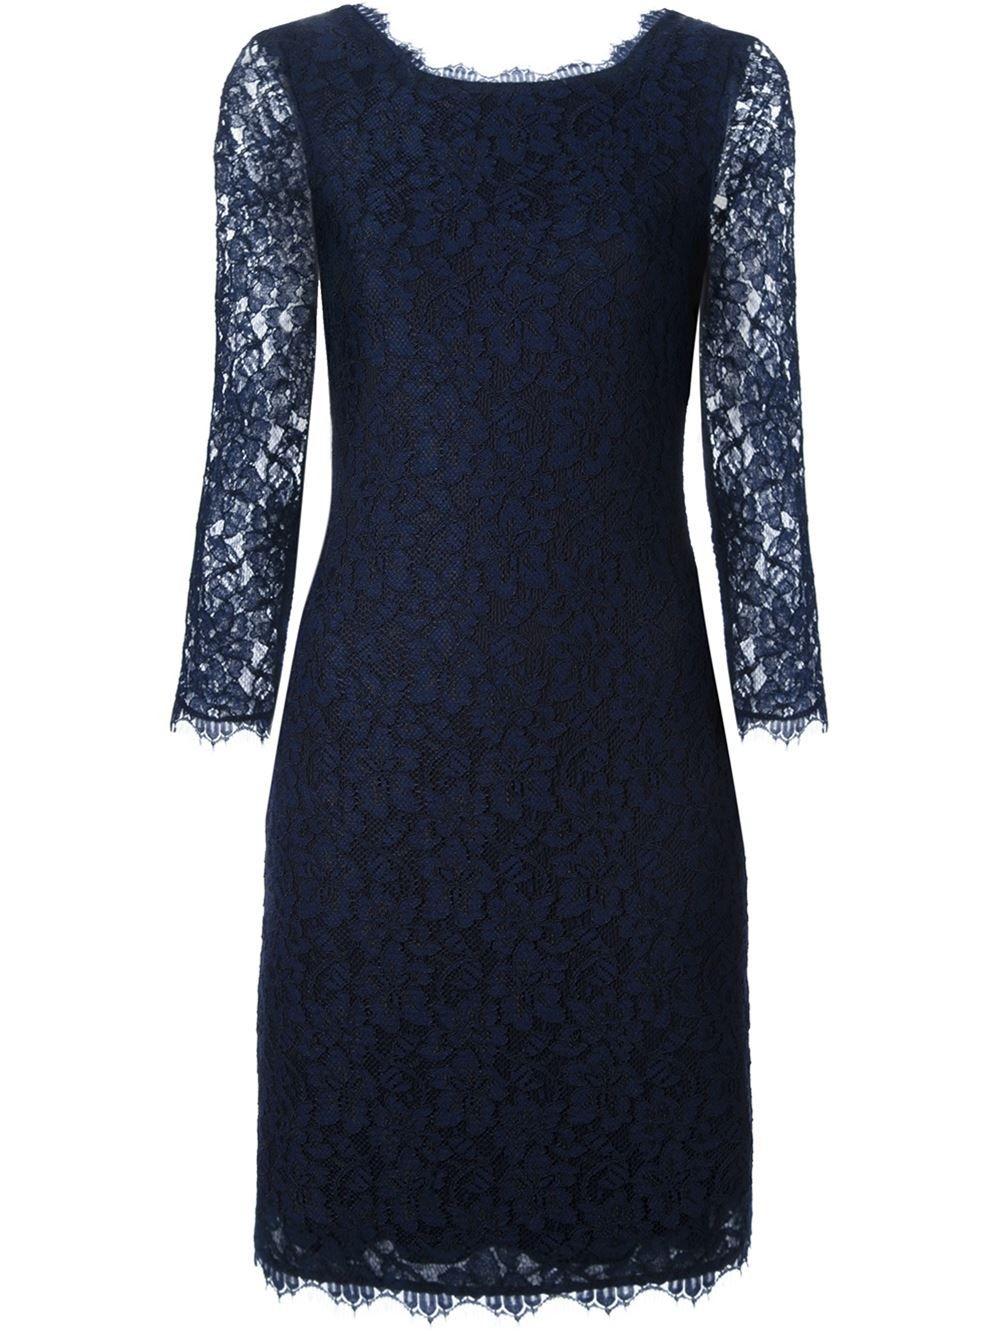 062f7f063 Diane Von Furstenberg Vestido azul marinho | vestir em 2019 ...